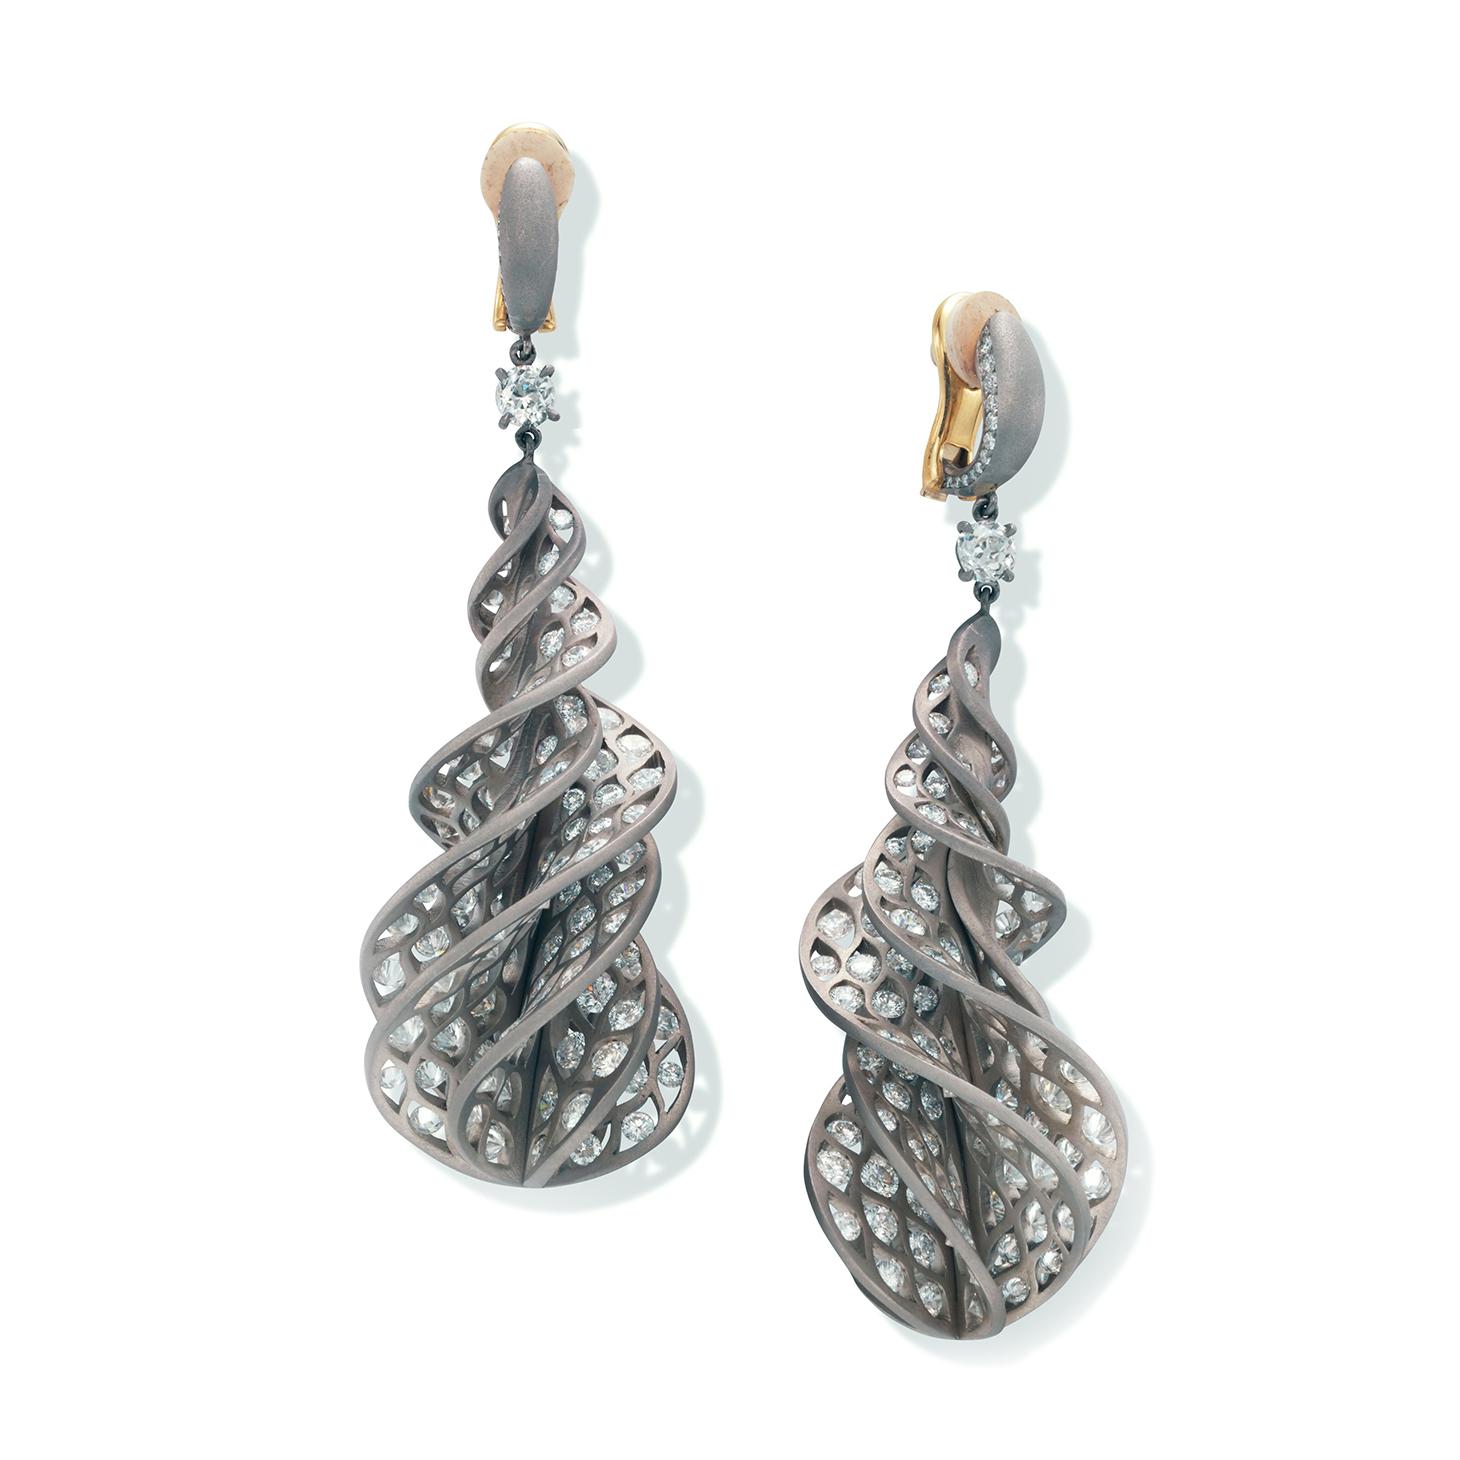 A Pair of Diamond and Titanium 'Twist' Ear Pendants, by SABBA